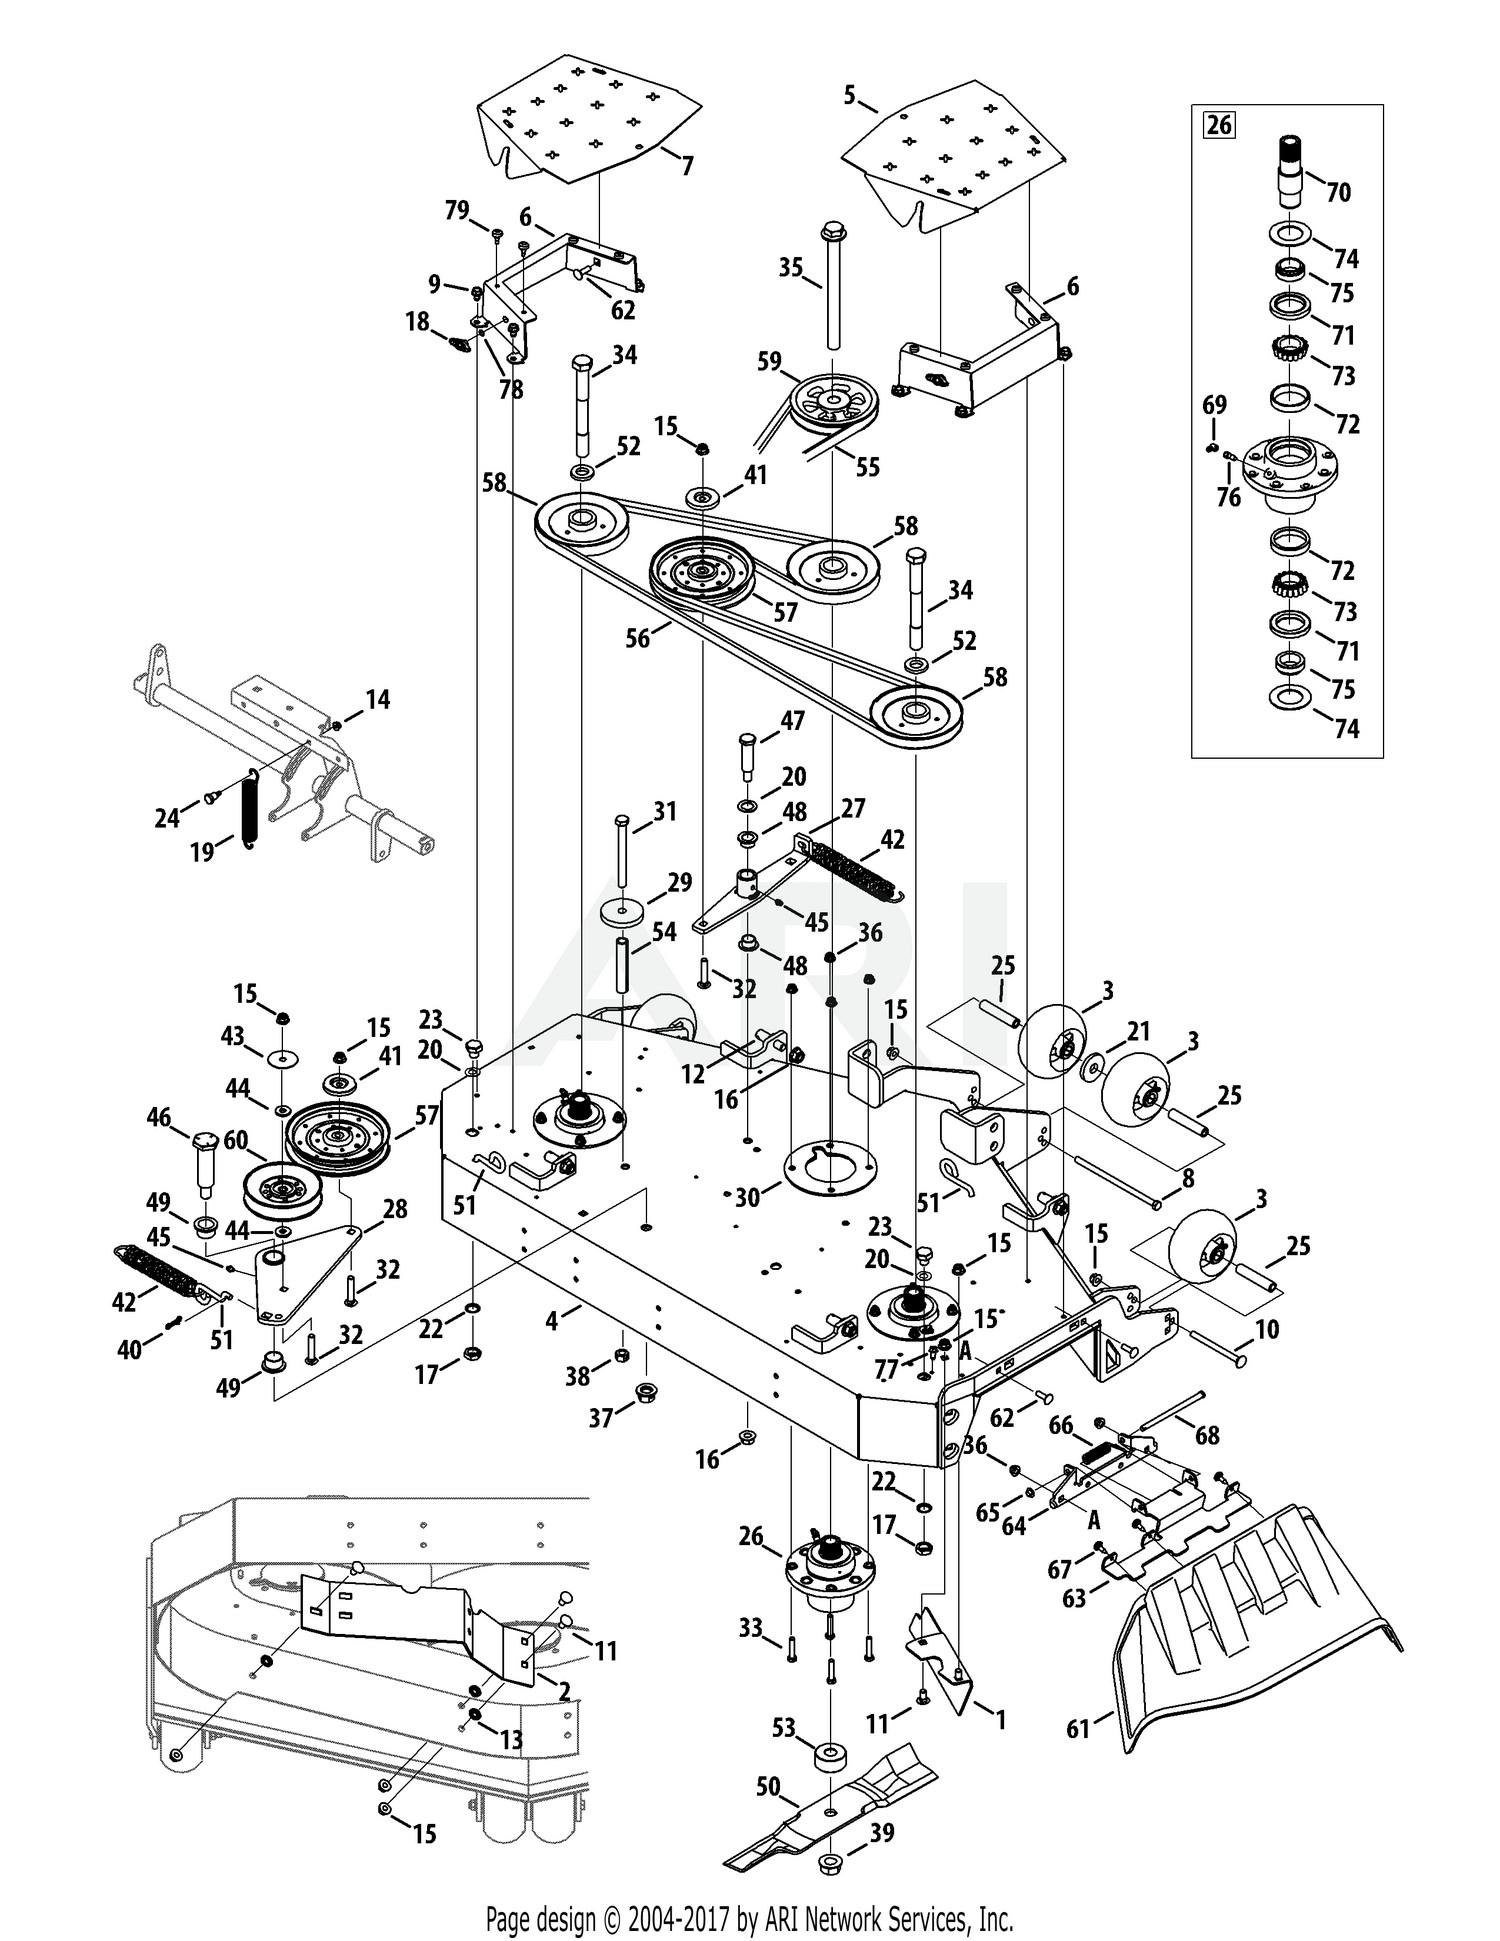 wiring diagram cub cadet 1018